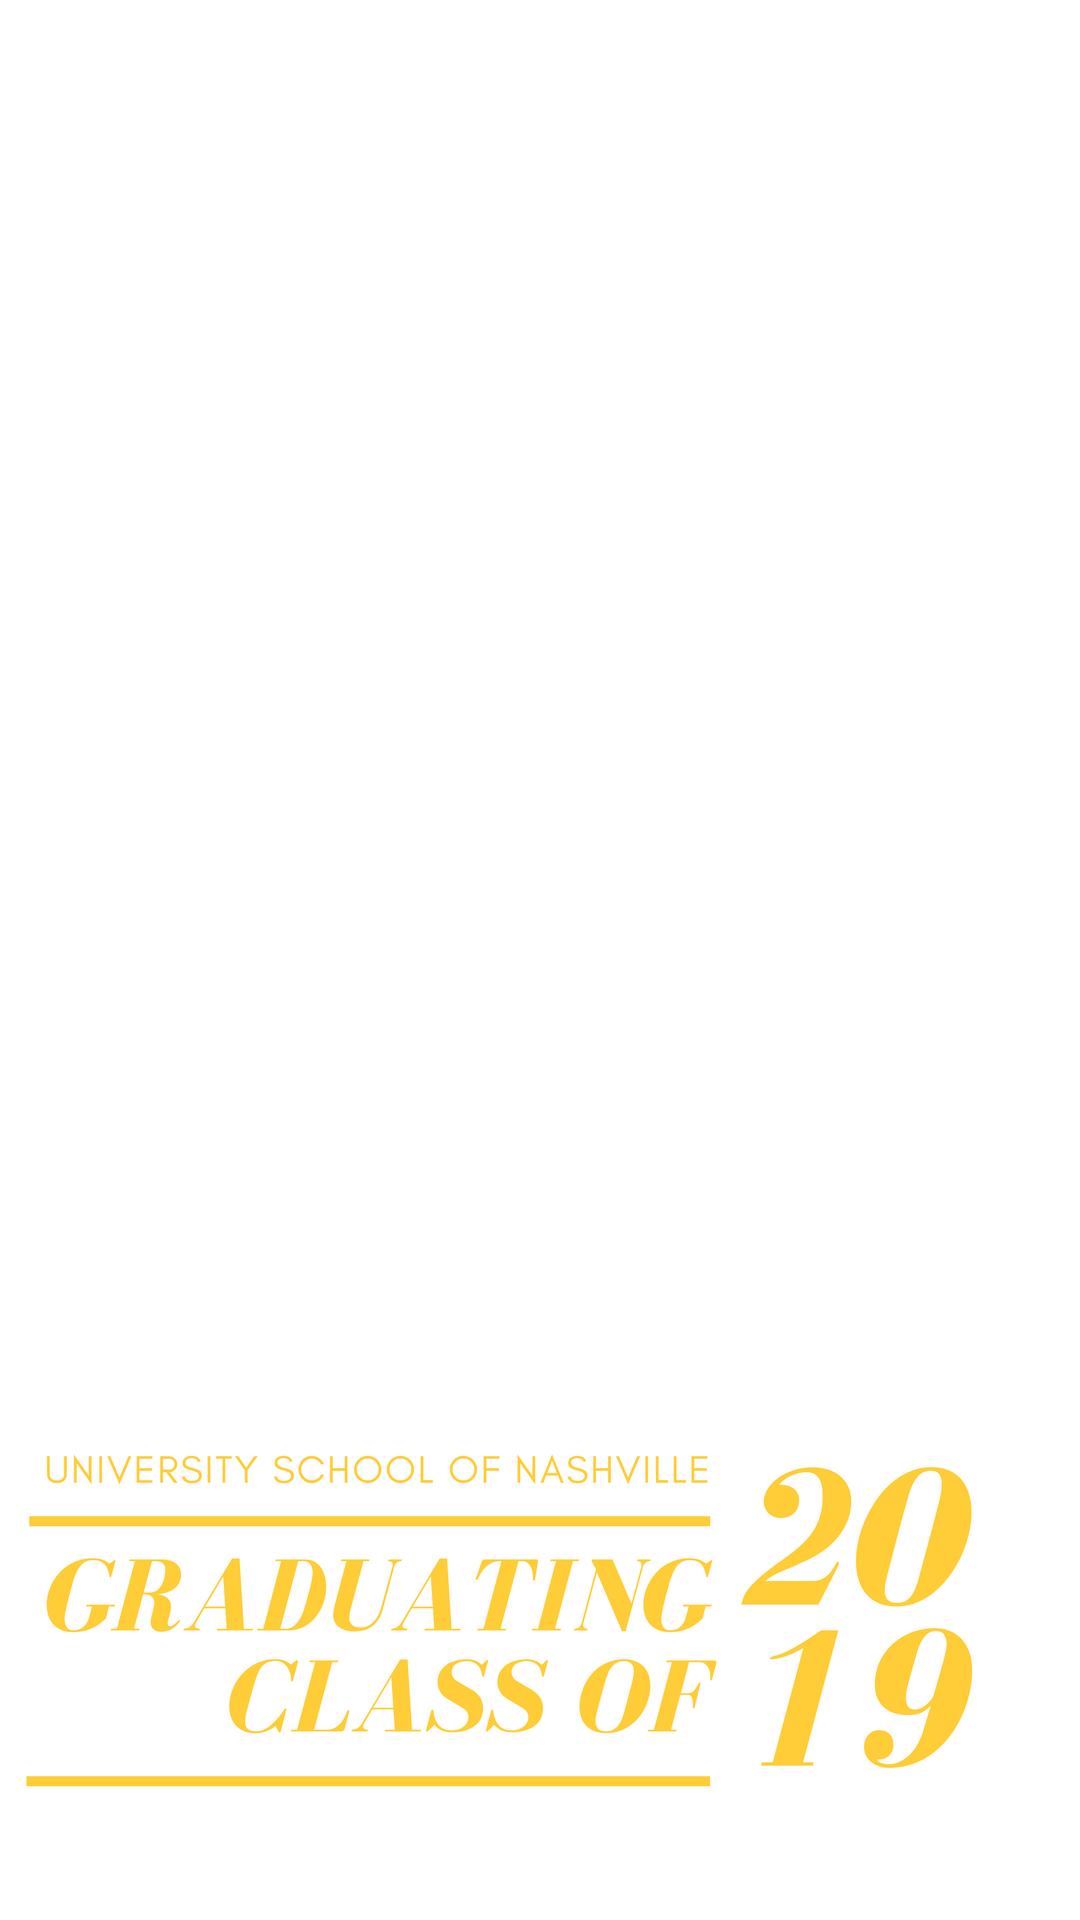 Golden University Graduation Snapchat Filter.png